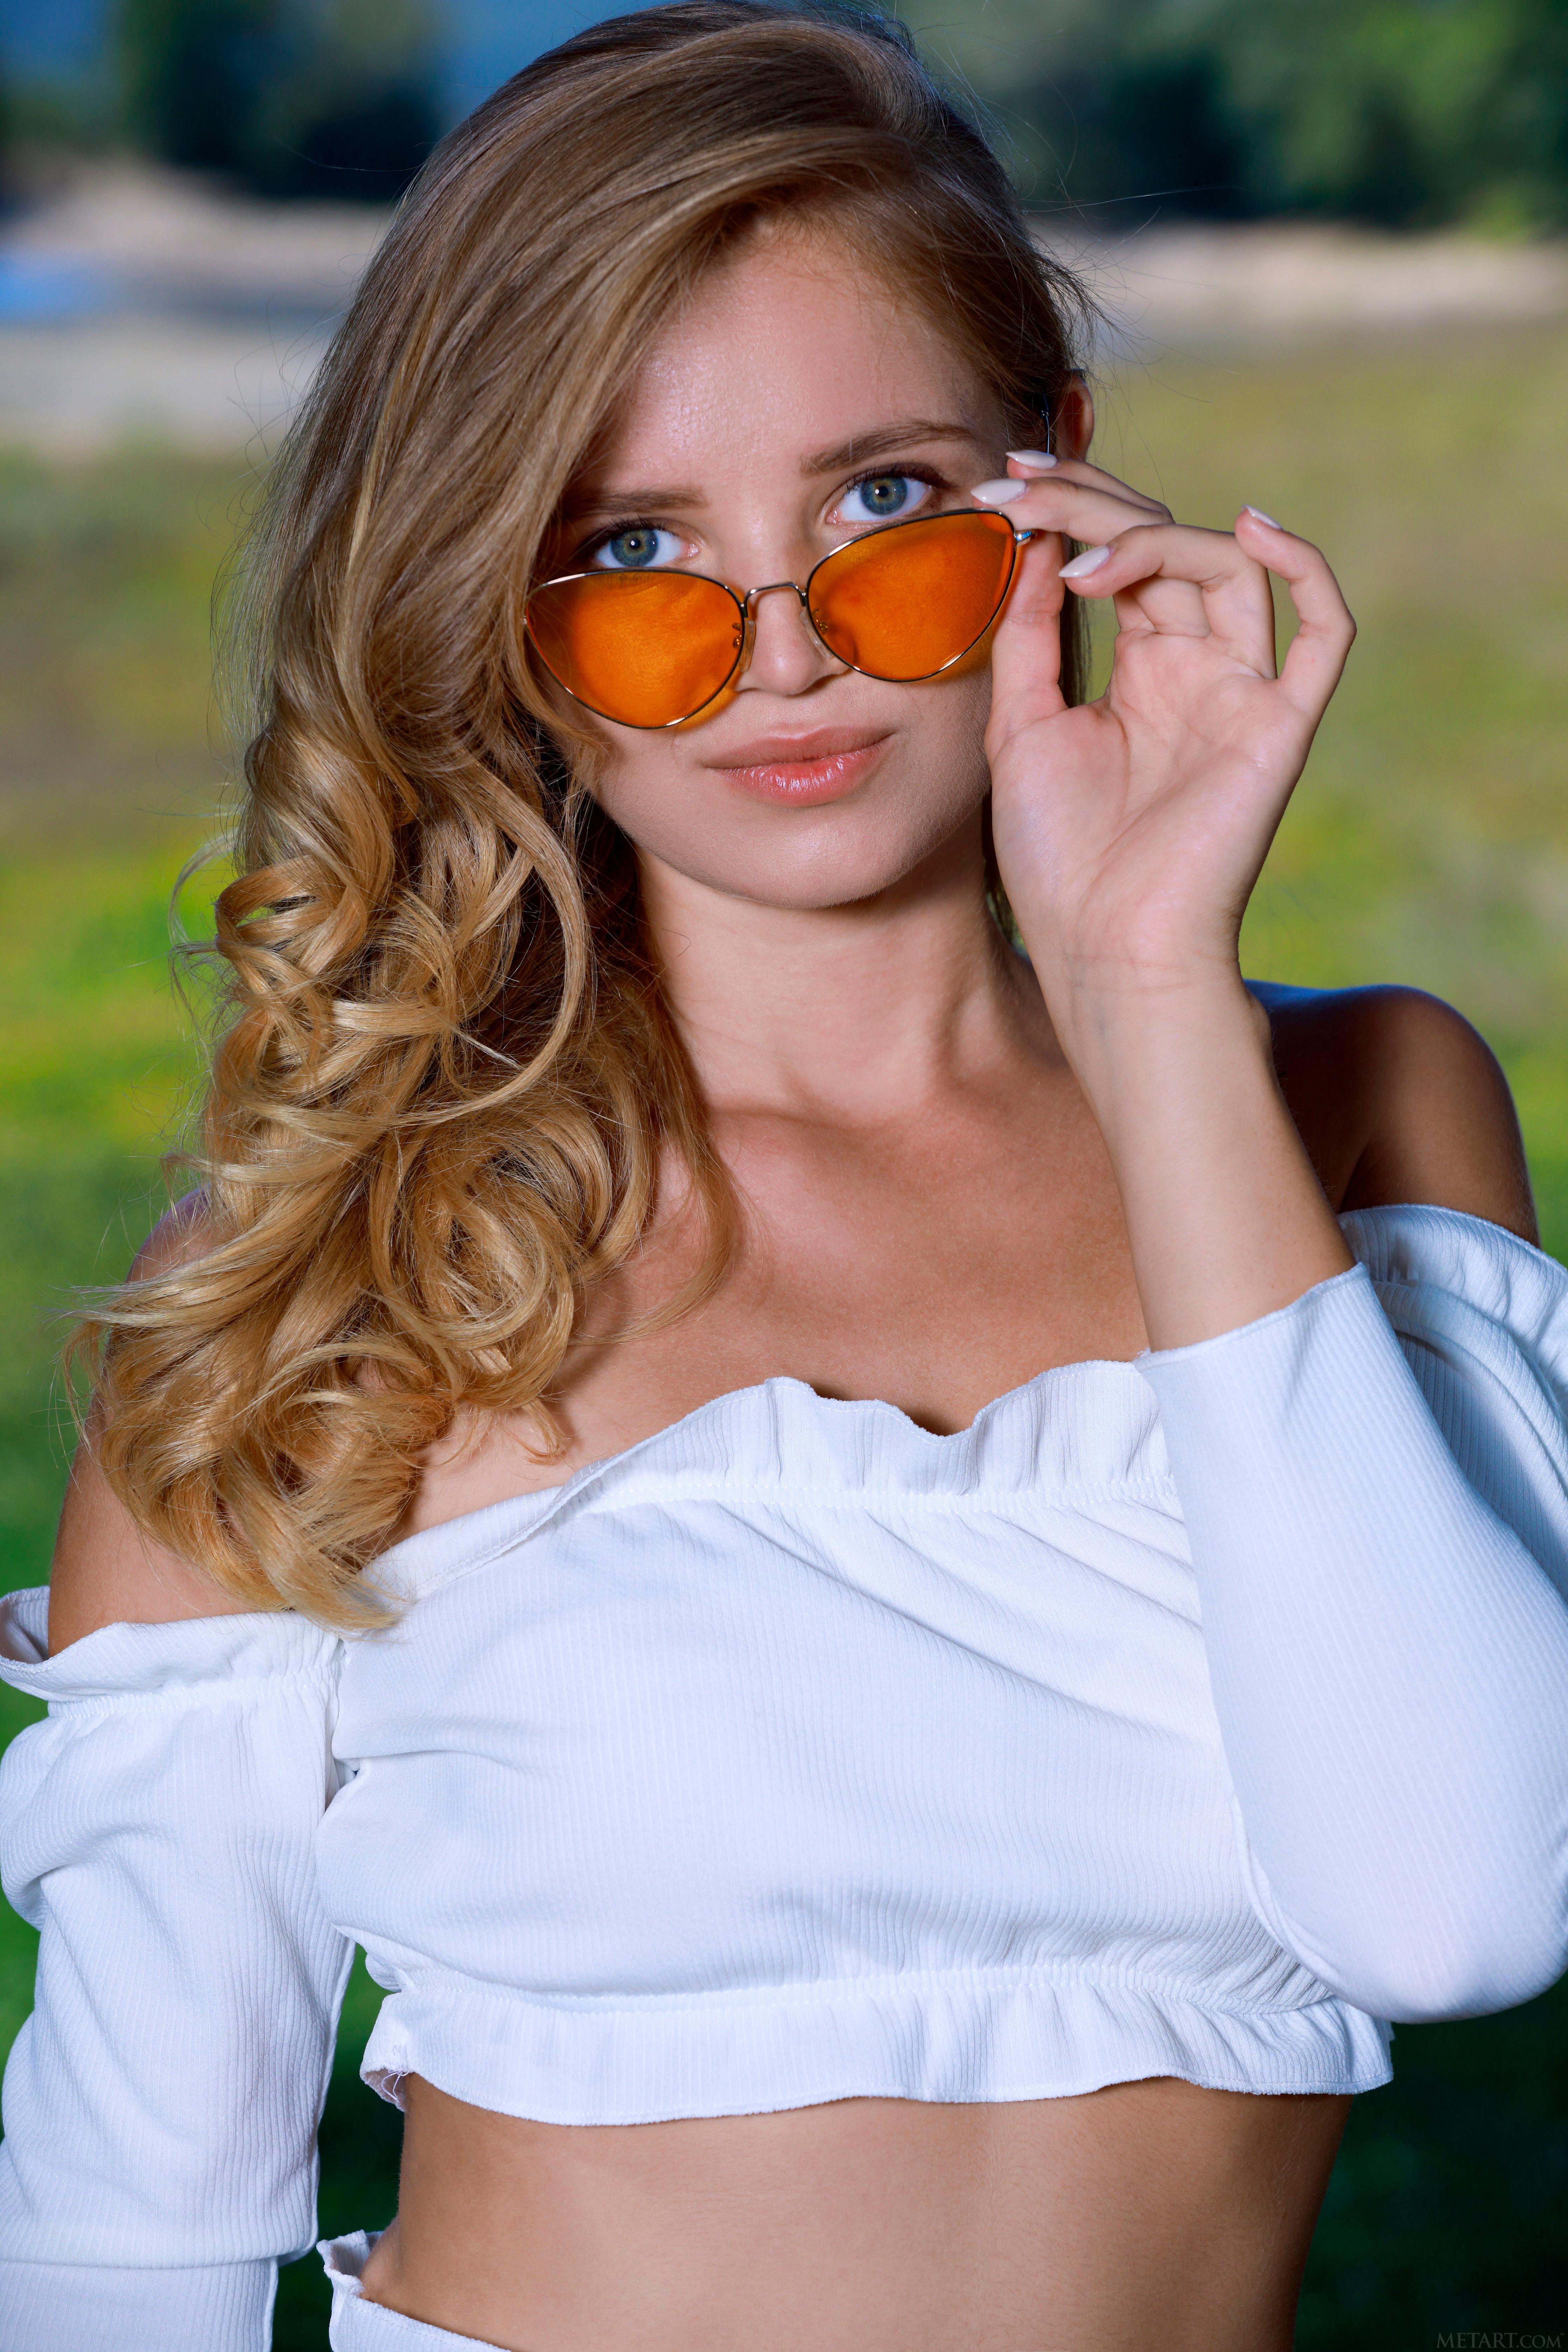 People 4480x6720 Gabriella women blonde long hair nature field grass plants trees blouse sunglasses blue eyes Met-Art MetArt Magazine